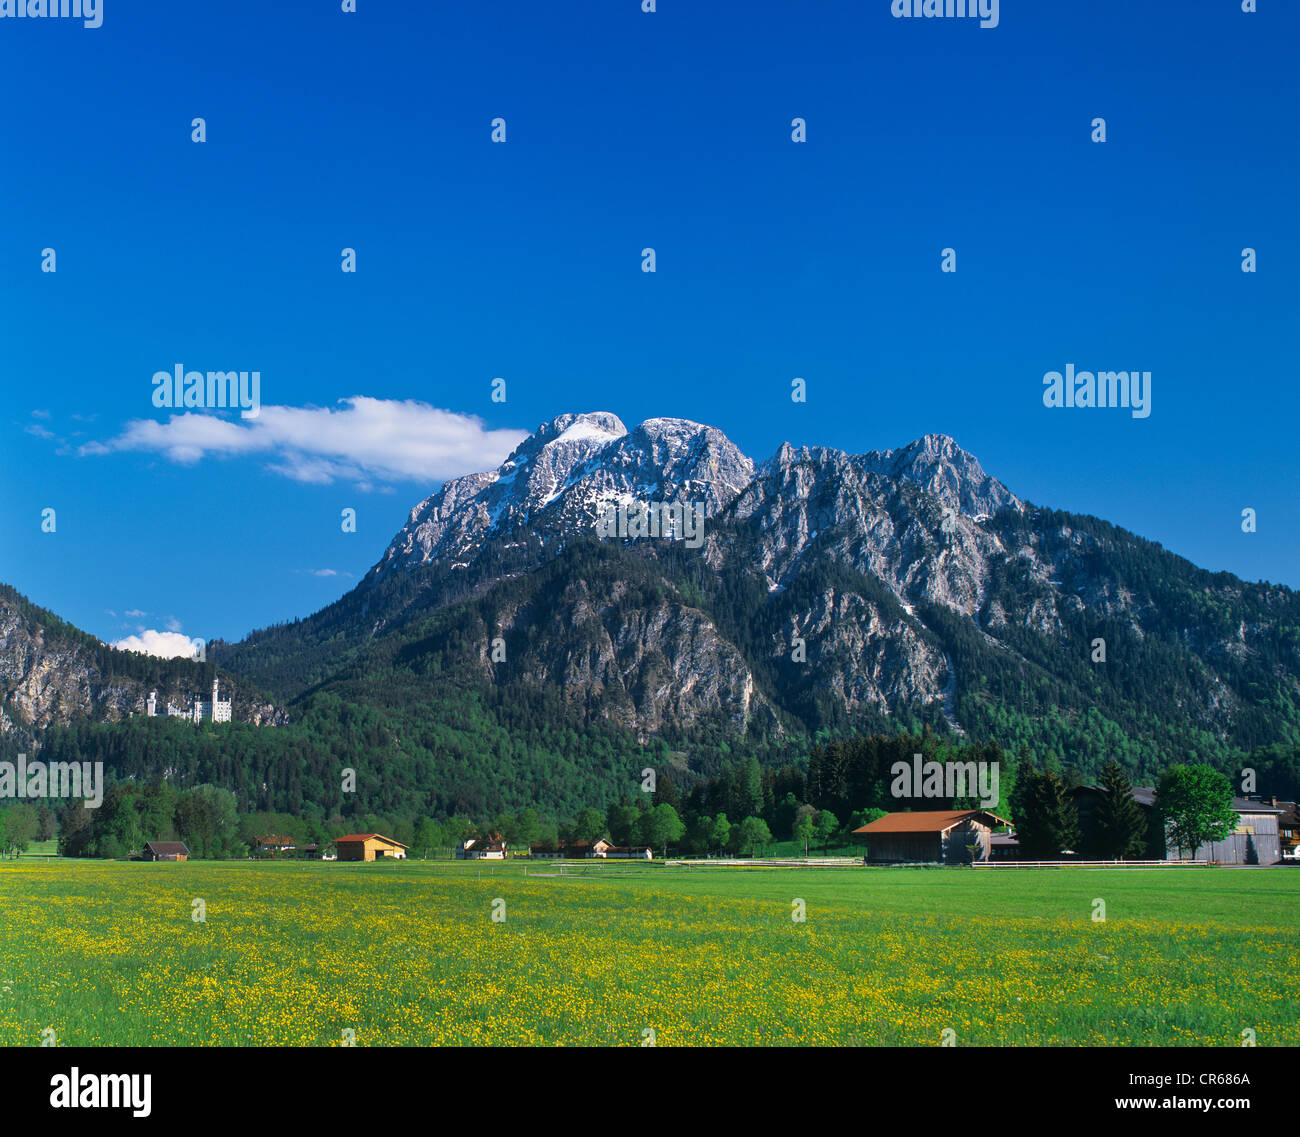 Schwangau, Allgaeu panorama di montagne e di rifugio, Schloss Castello di Neuschwanstein, sinistra, Baviera, Germania, Immagini Stock